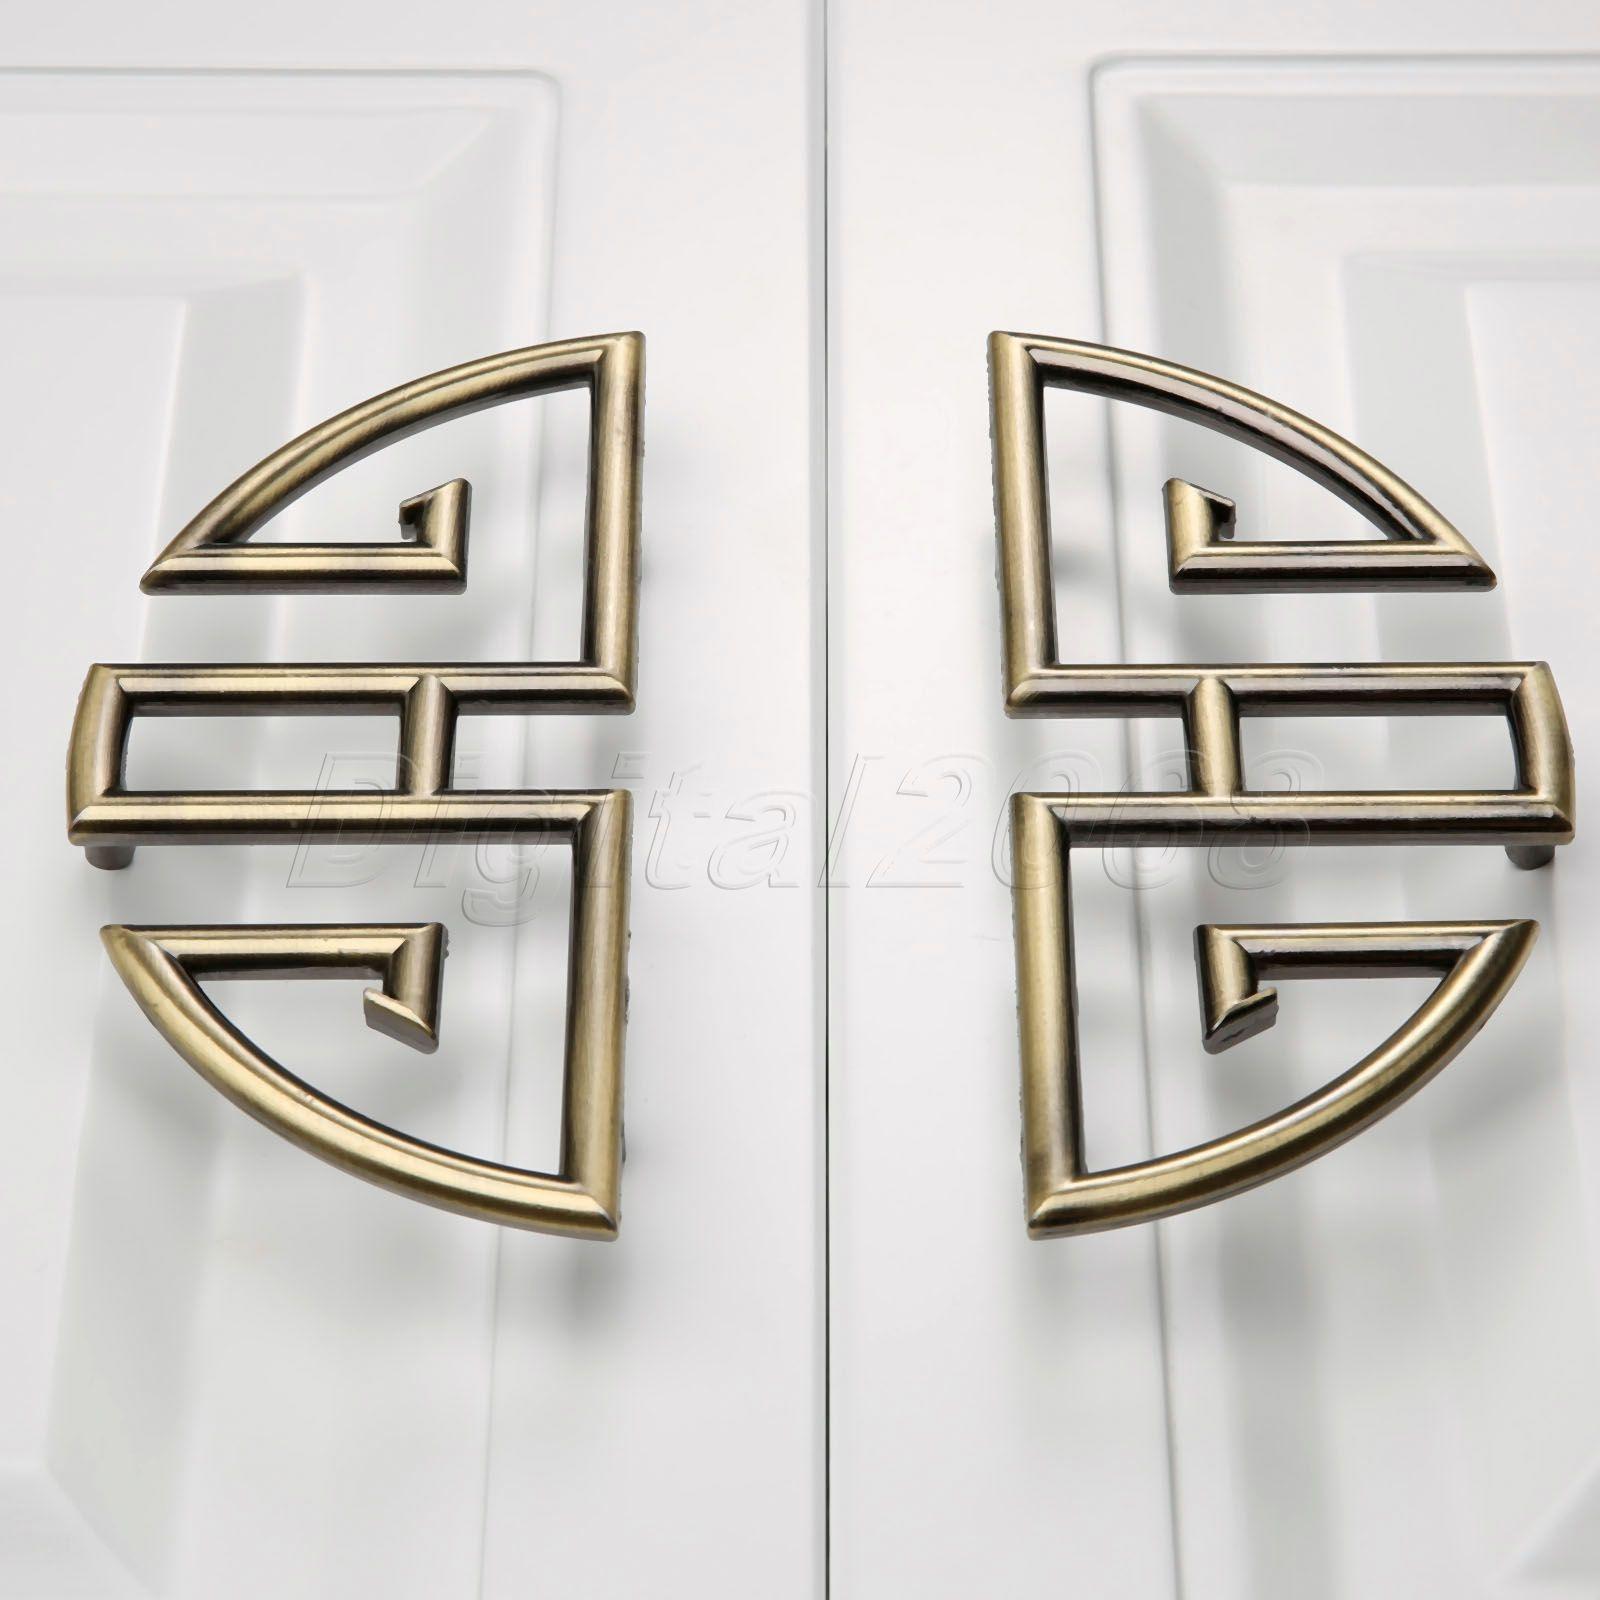 Contemporary door knobs and handles - 1 Pair 96mm Vintage Furniture Cupboard Wardrobe Handles And Knobs Antique Bronze Alloy Kitchen Cabinet Door Drawer Pull Handle